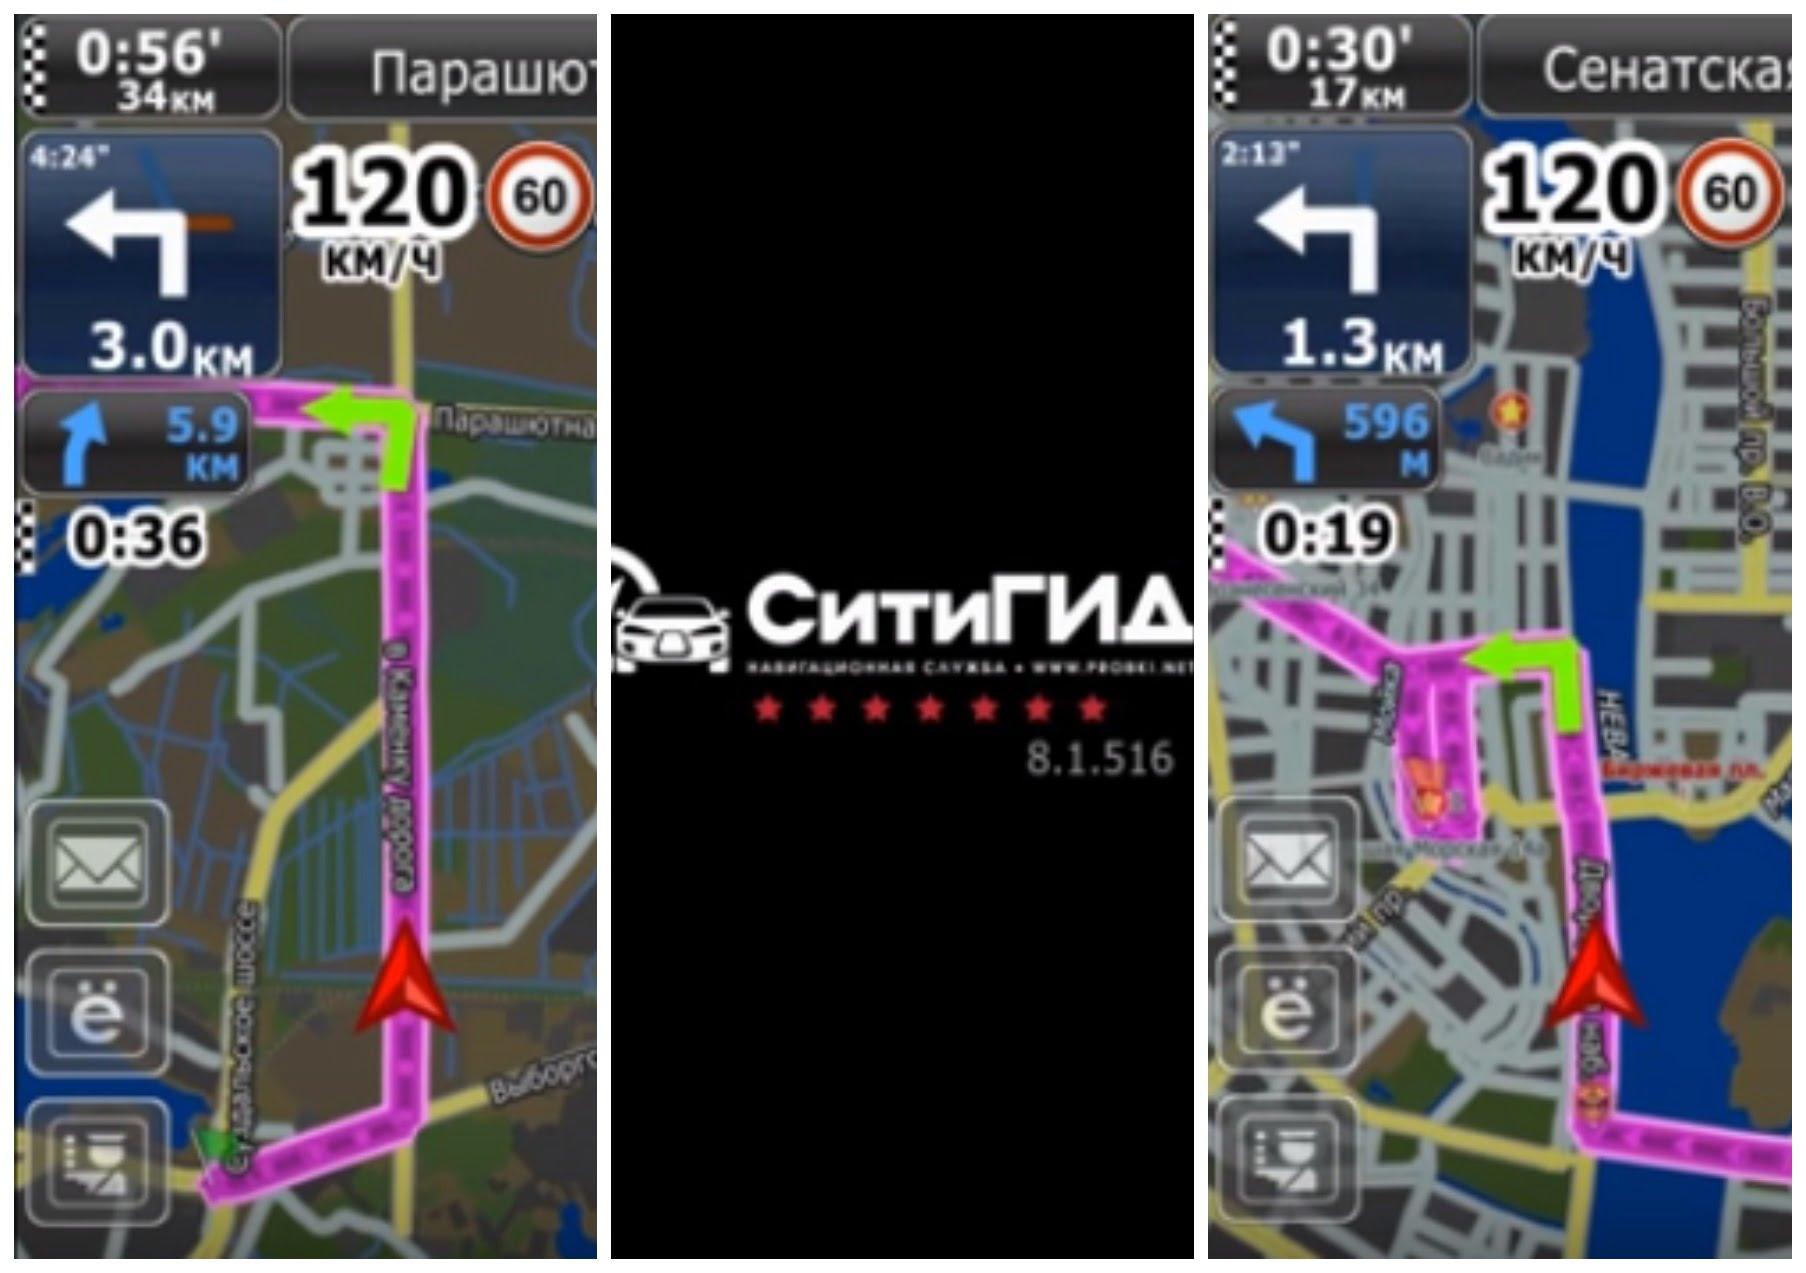 На фото изображен навигатор CityGuide